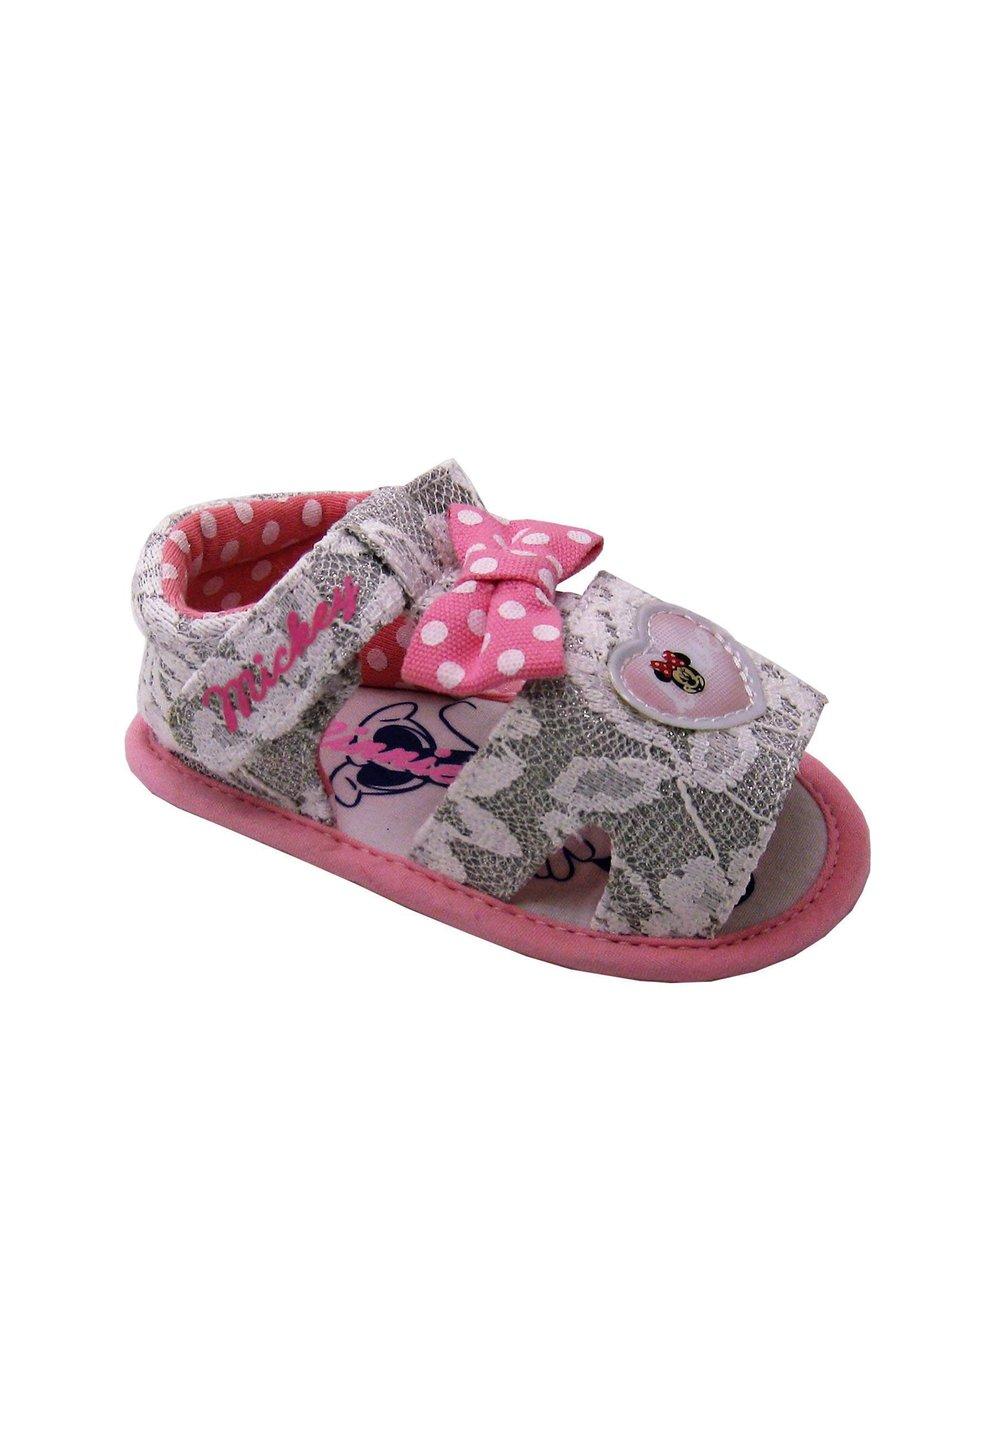 Sandale bebe, alb cu dantela, Minnie Mouse imagine